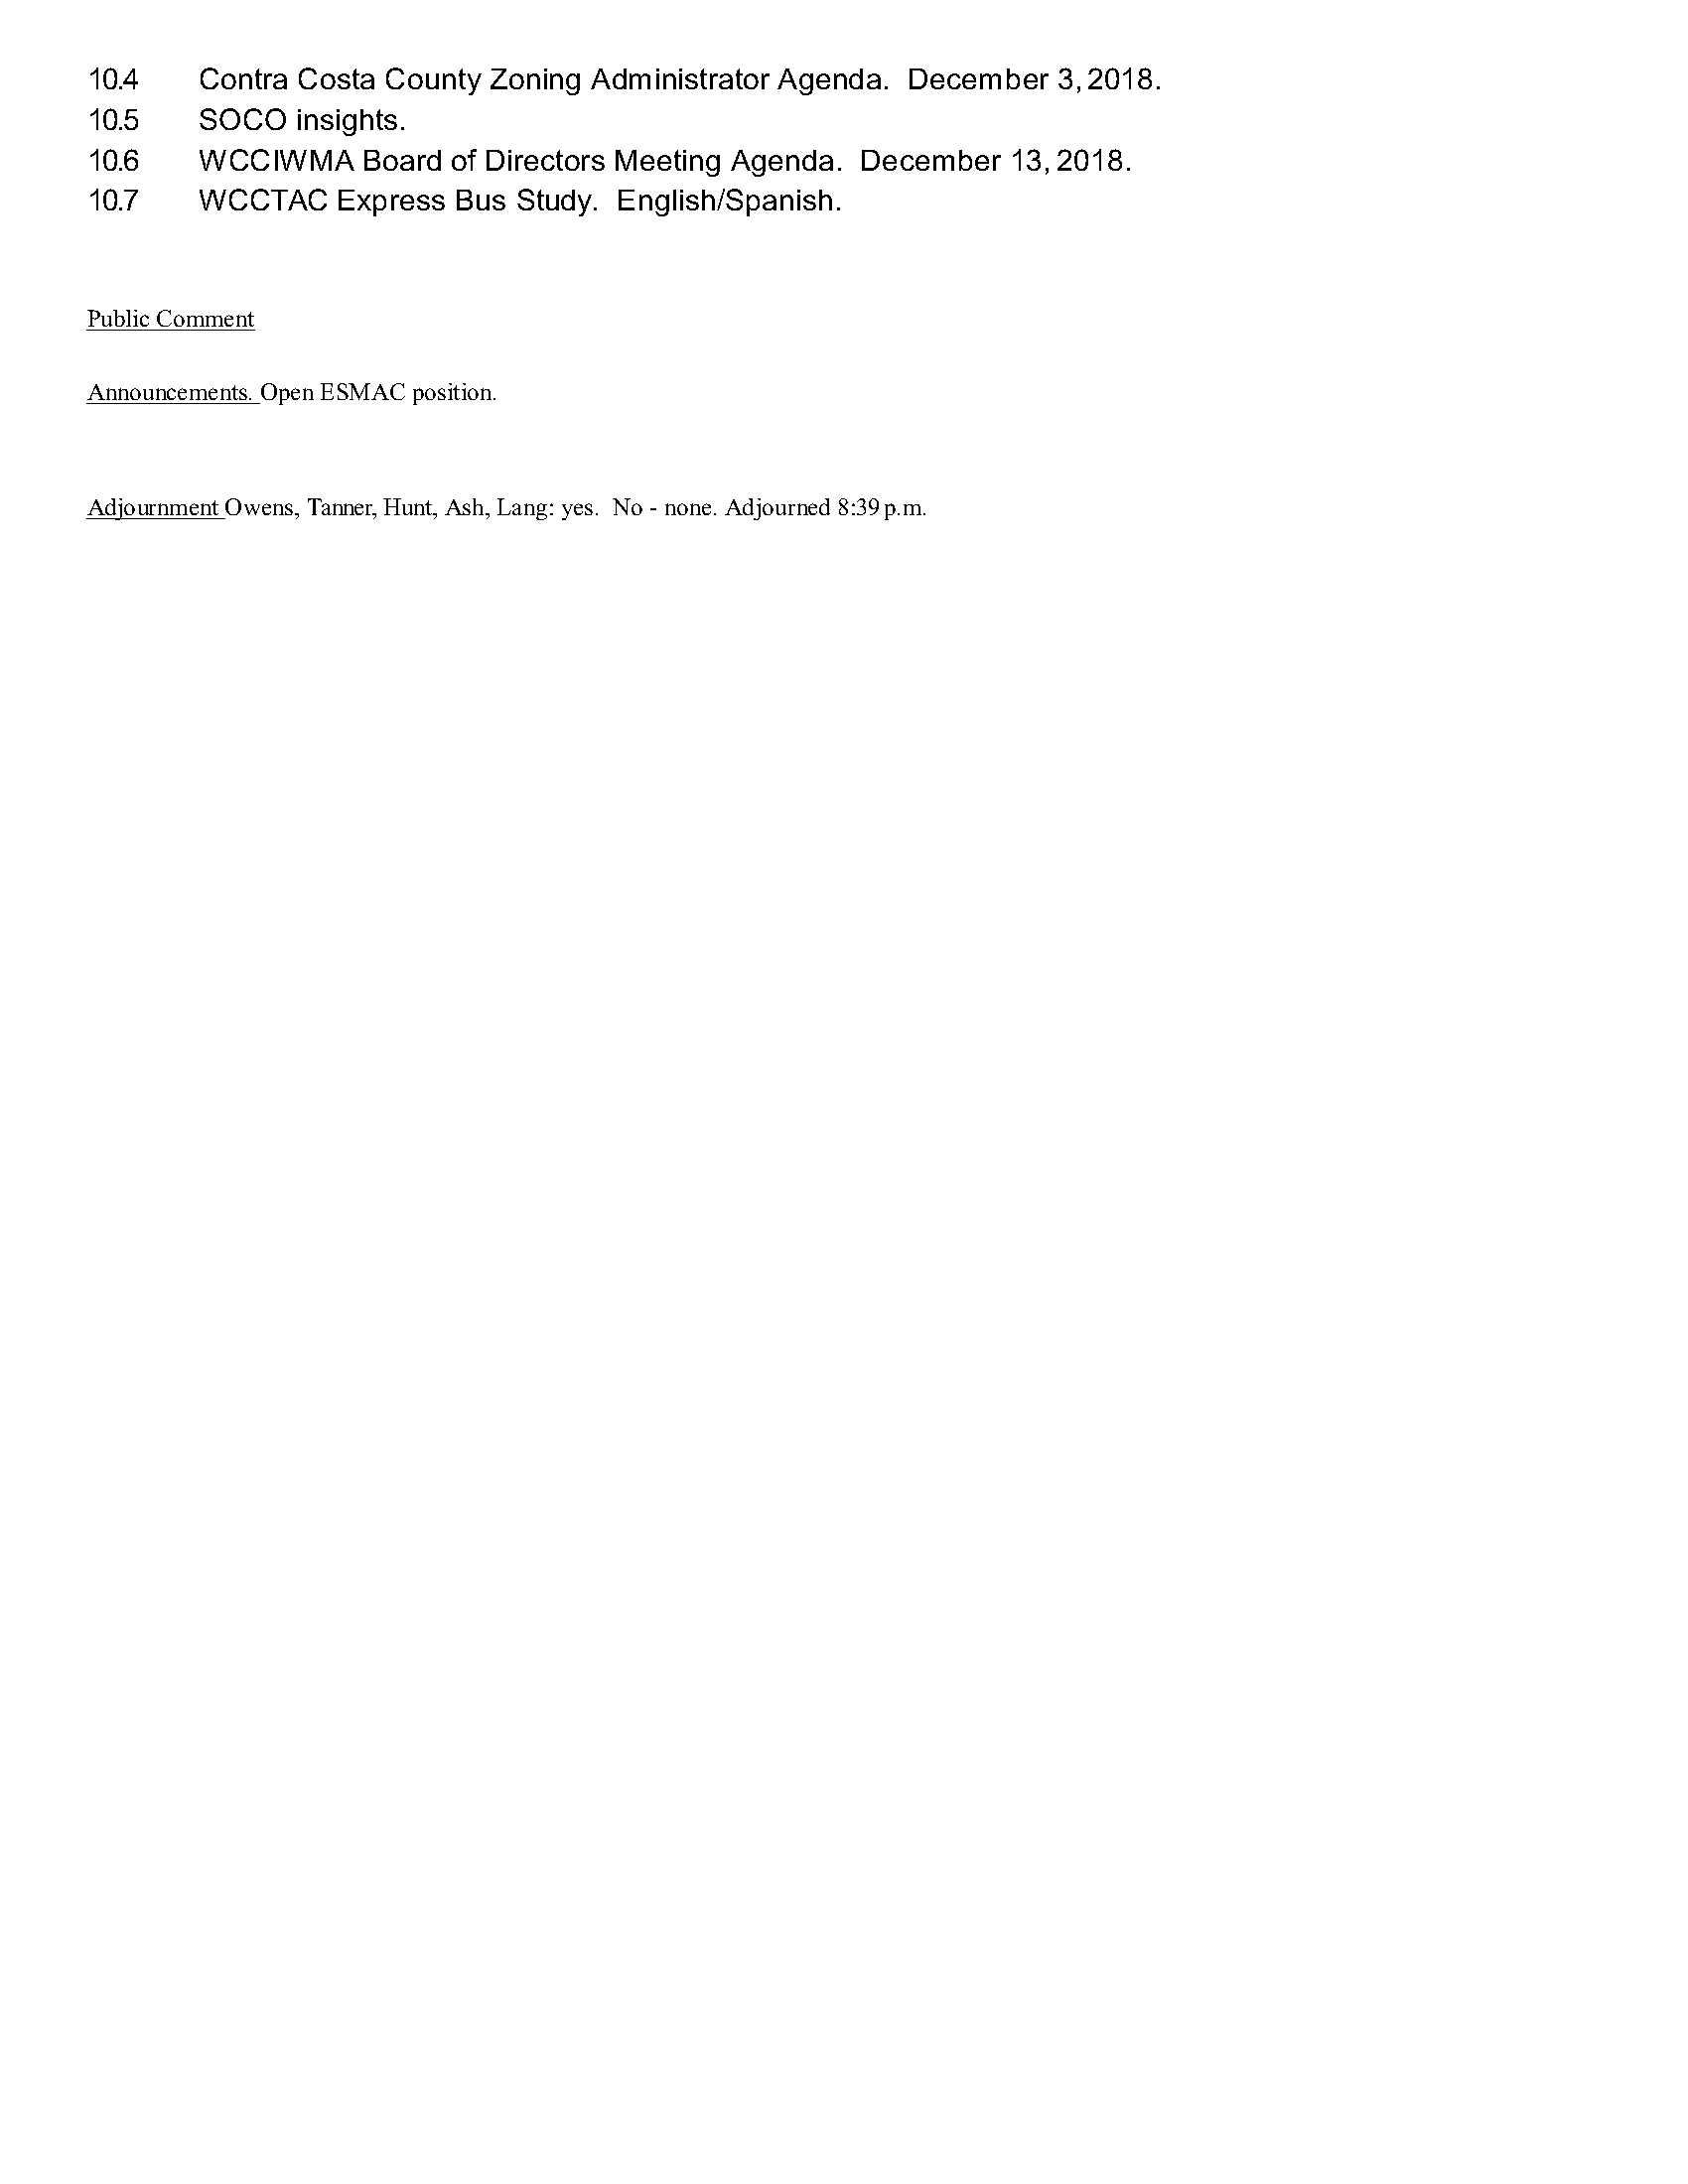 ESMAC Agenda 1.9.2019 (34 Pages)_6.jpg